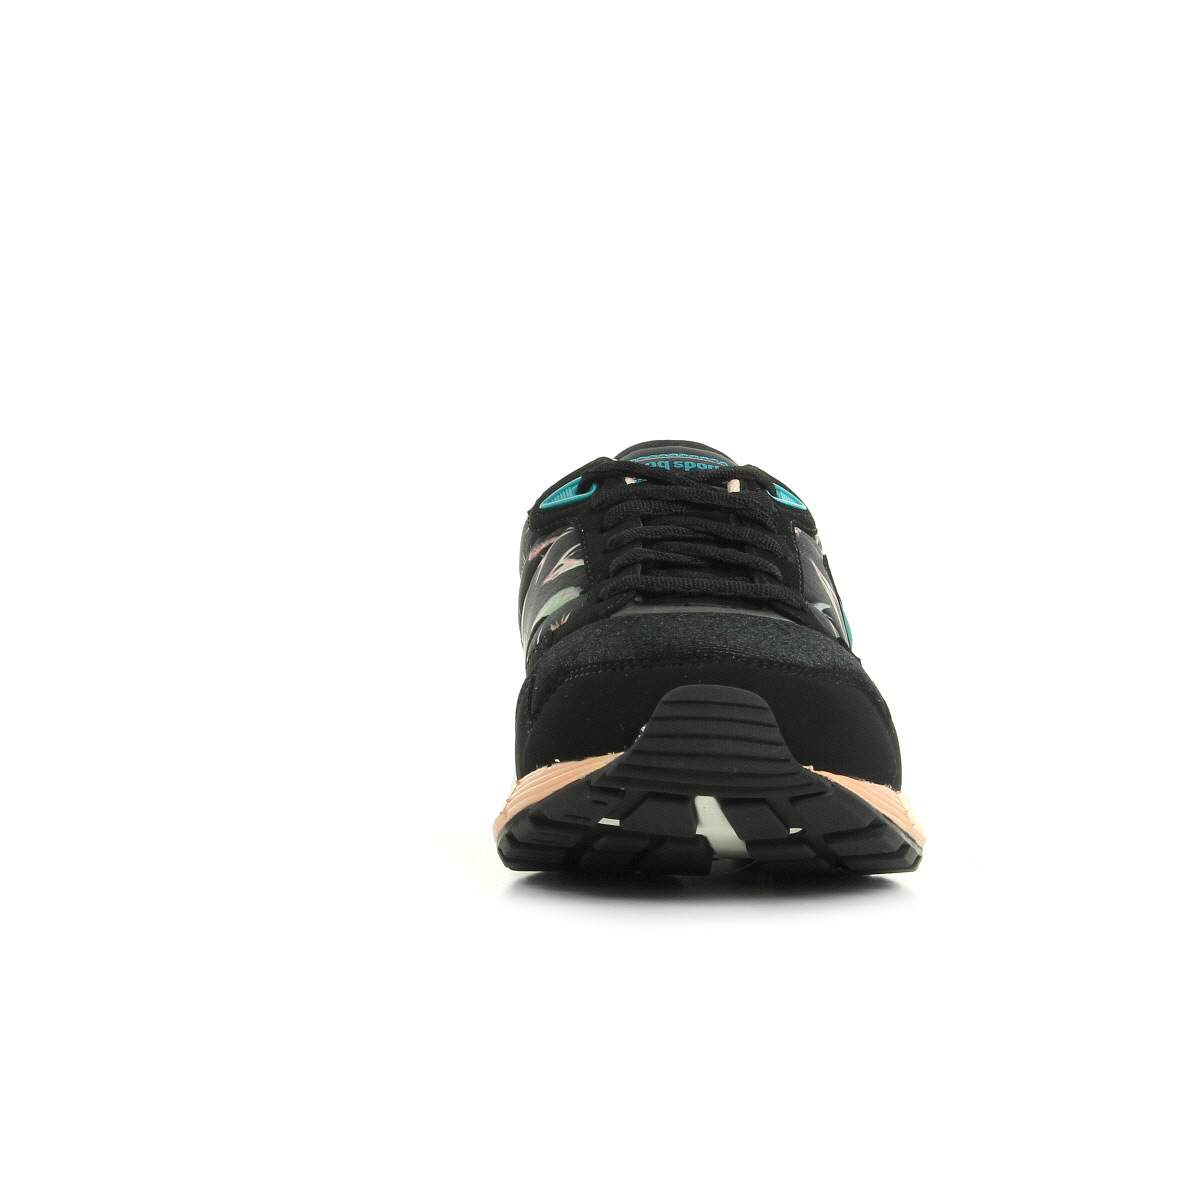 Le Coq Sportif Omega X Bird Of Paradise 1610561, Baskets mode femme